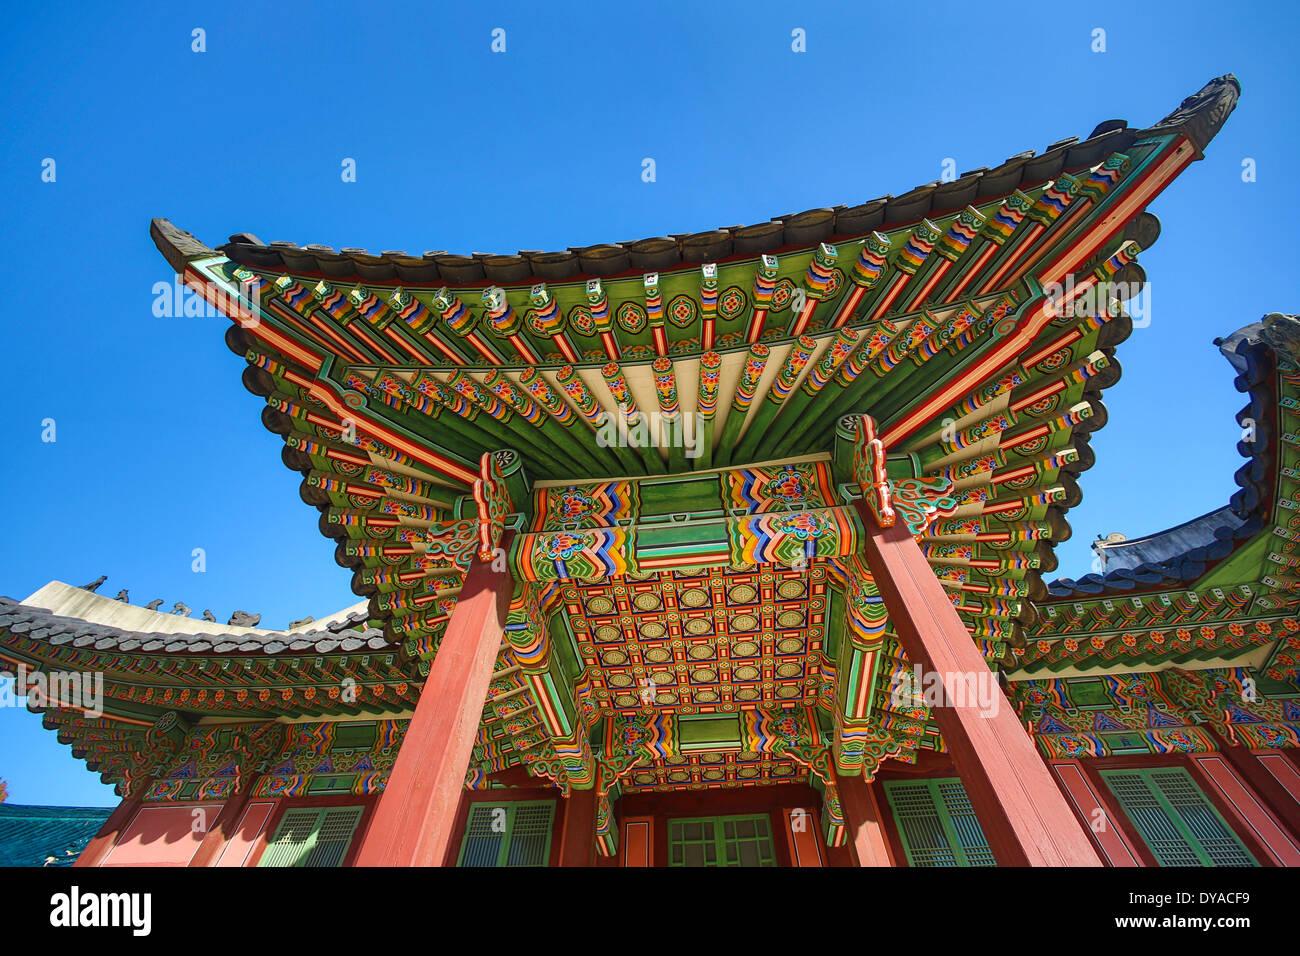 Welterbe, Gyeongbokgung, Korea, Seoul, Asien, Architektur, Decke, bunte, Geschichte, Schloss, Tourismus, Reisen, Unesco Stockbild